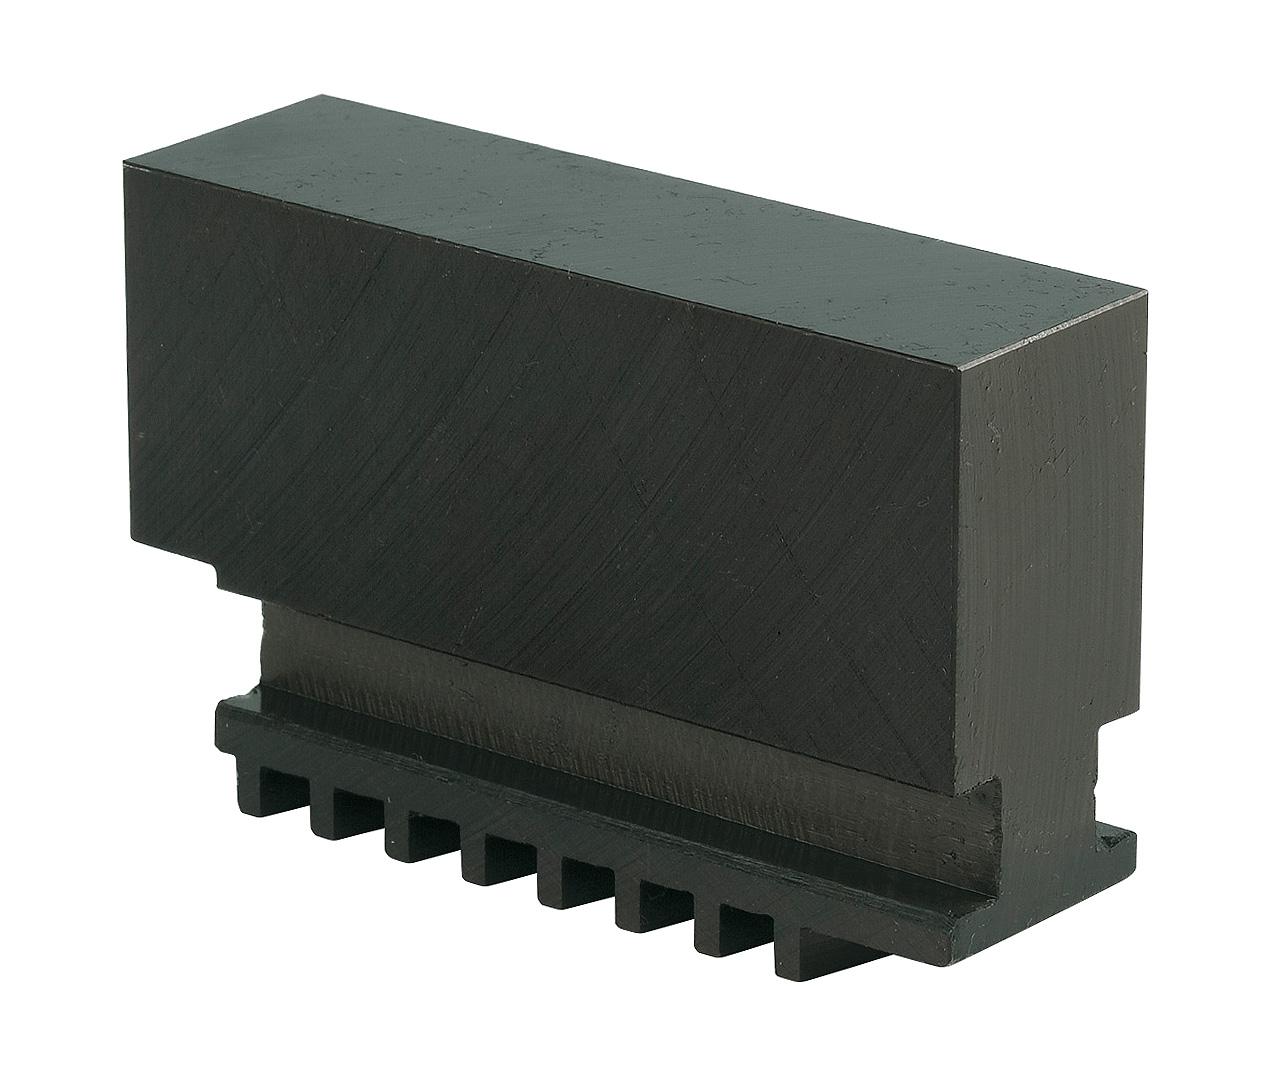 Szczęki jednolite miękkie - komplet DSJ-DK12-400 BERNARDO